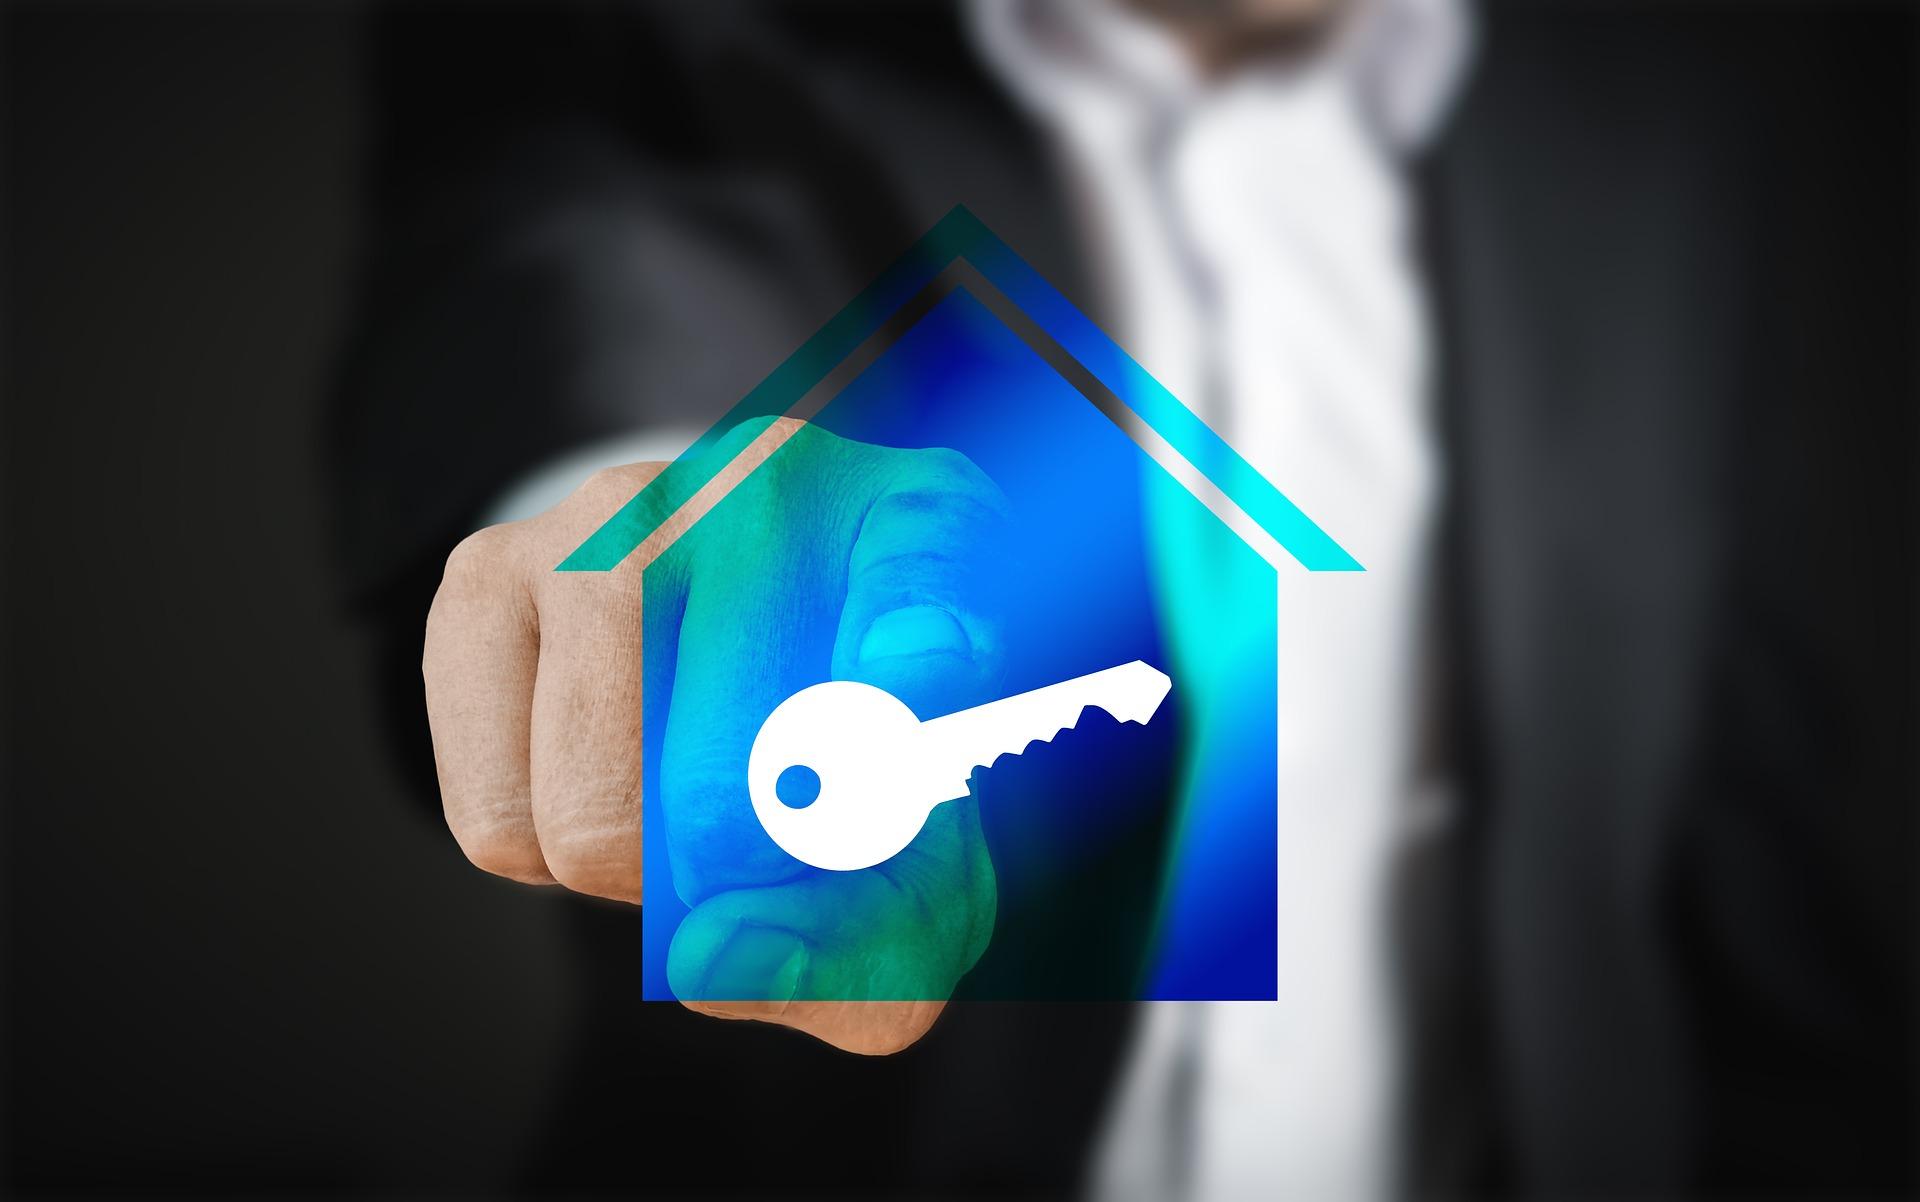 smart-home-3317437_1920